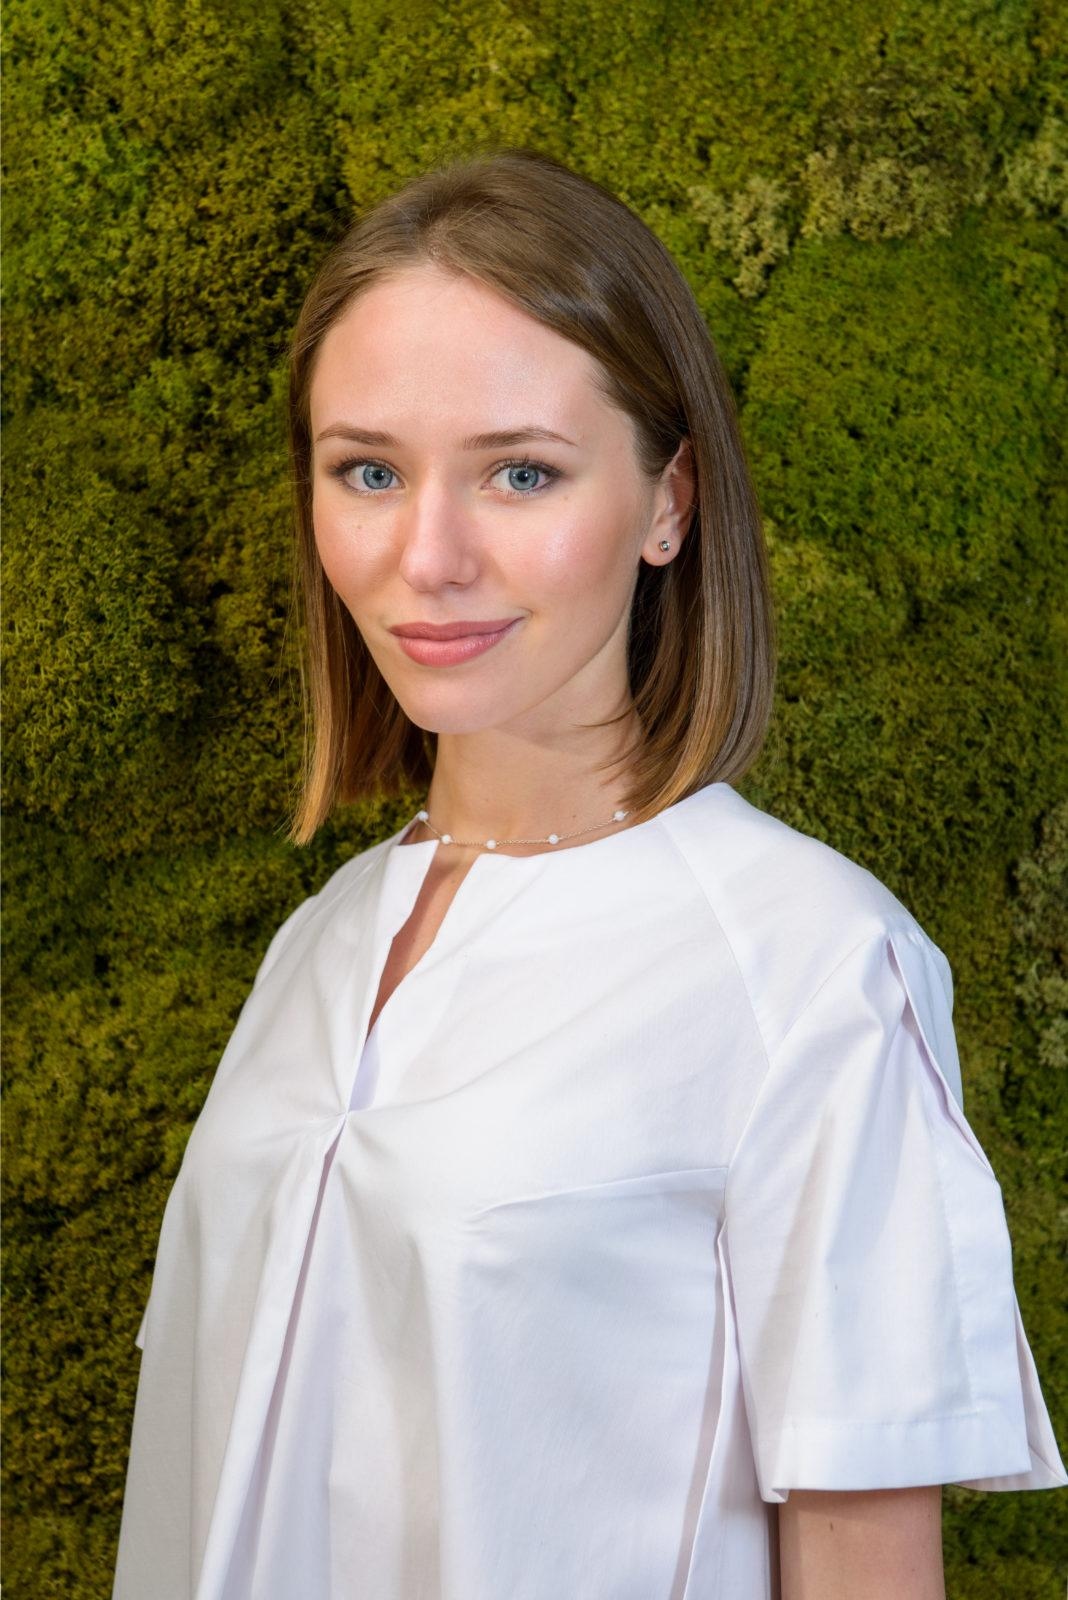 Лытасова Вероника Евгеньевна стоматолог терапевт